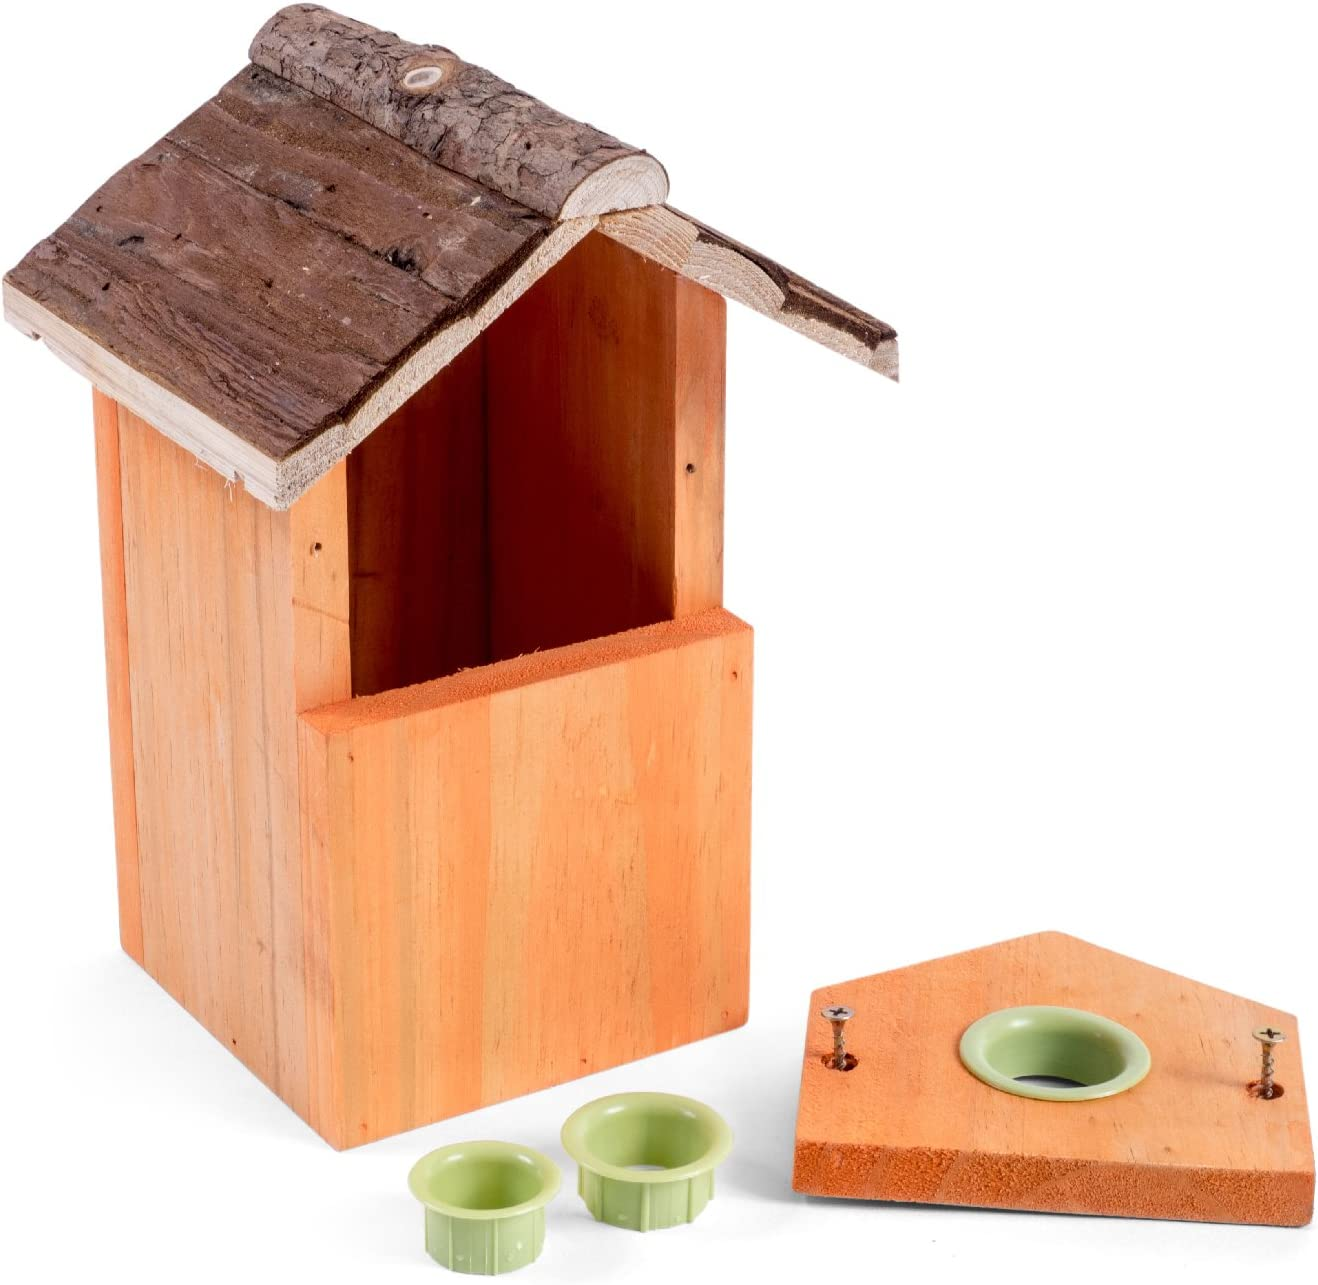 Beige Petface Multi Nest Box barked 12x12.5x26 cm